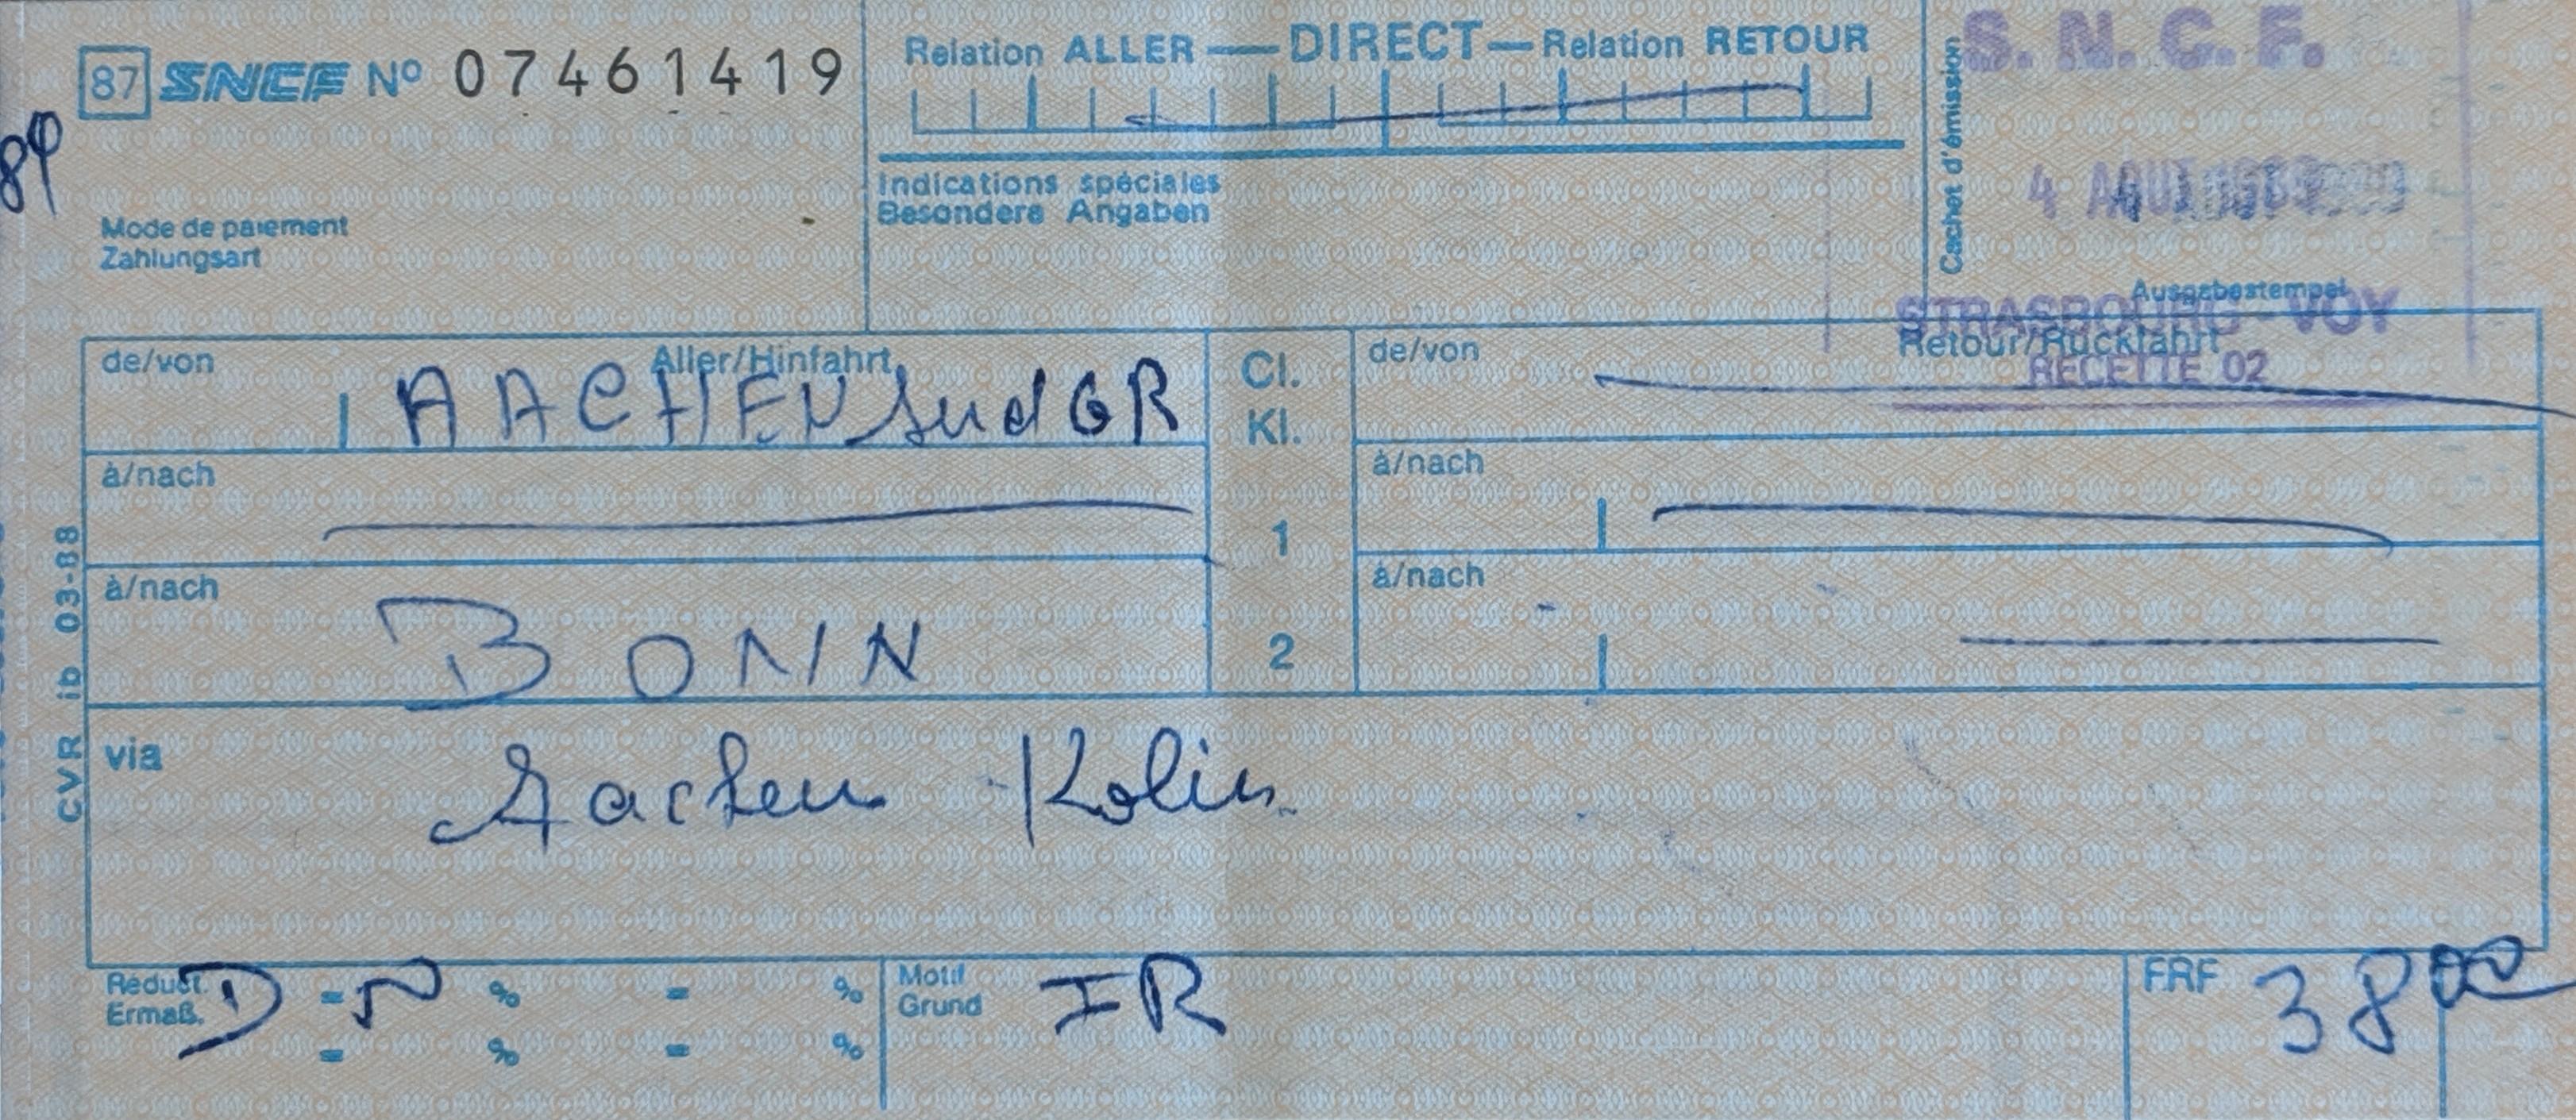 InterRail 1989: Bahnticket Aachen - Bonn